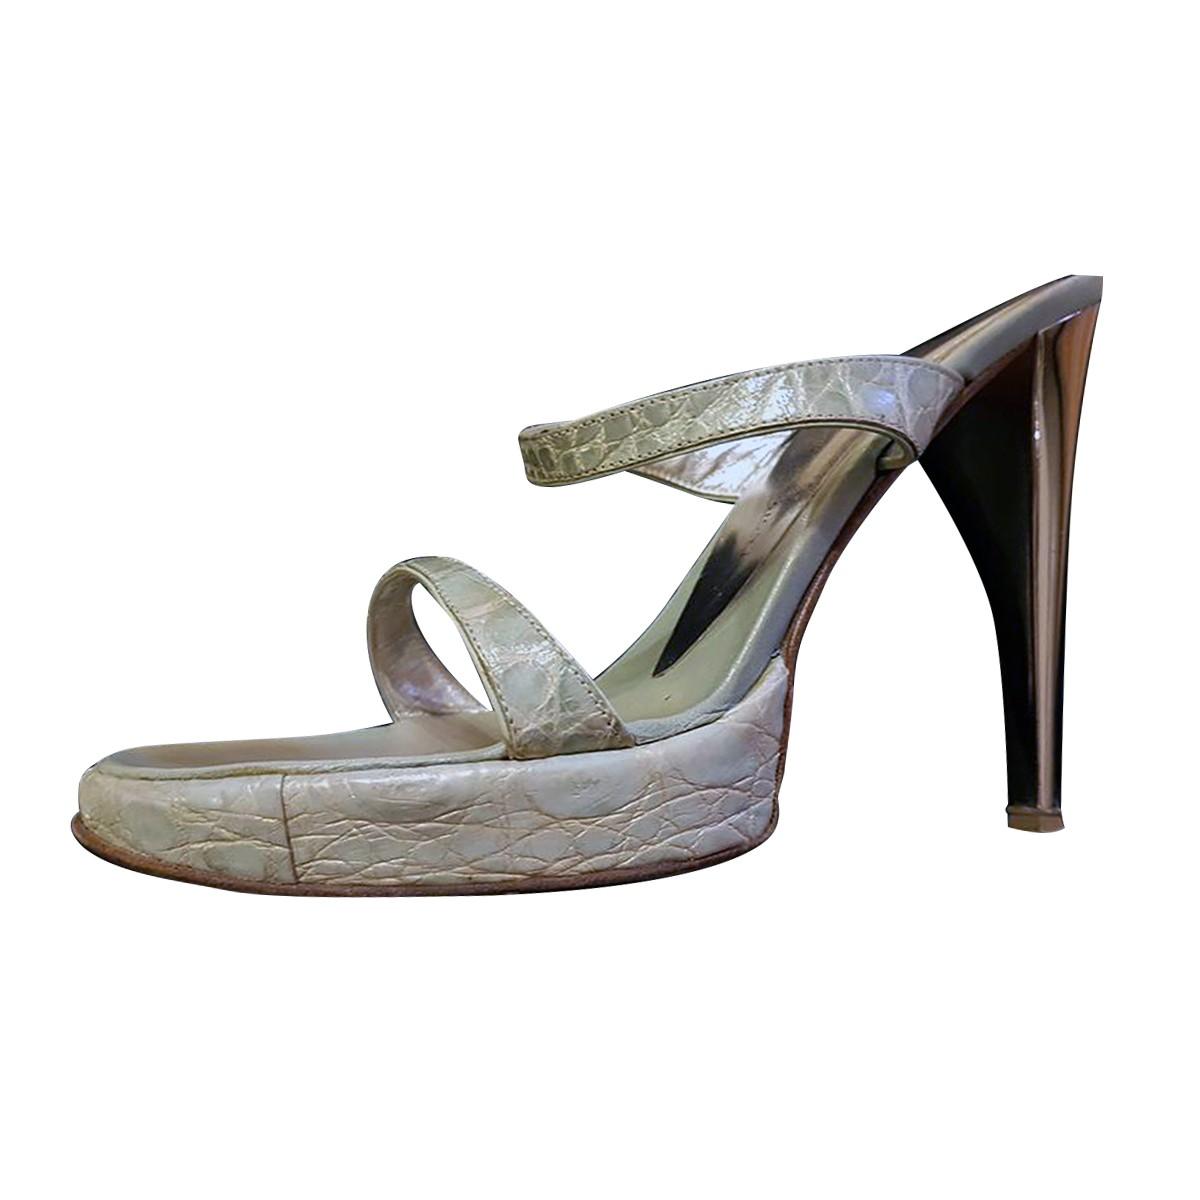 86395ea8bb27c Giuseppe Zanotti Sandal Crocodile High Heel | My good closet